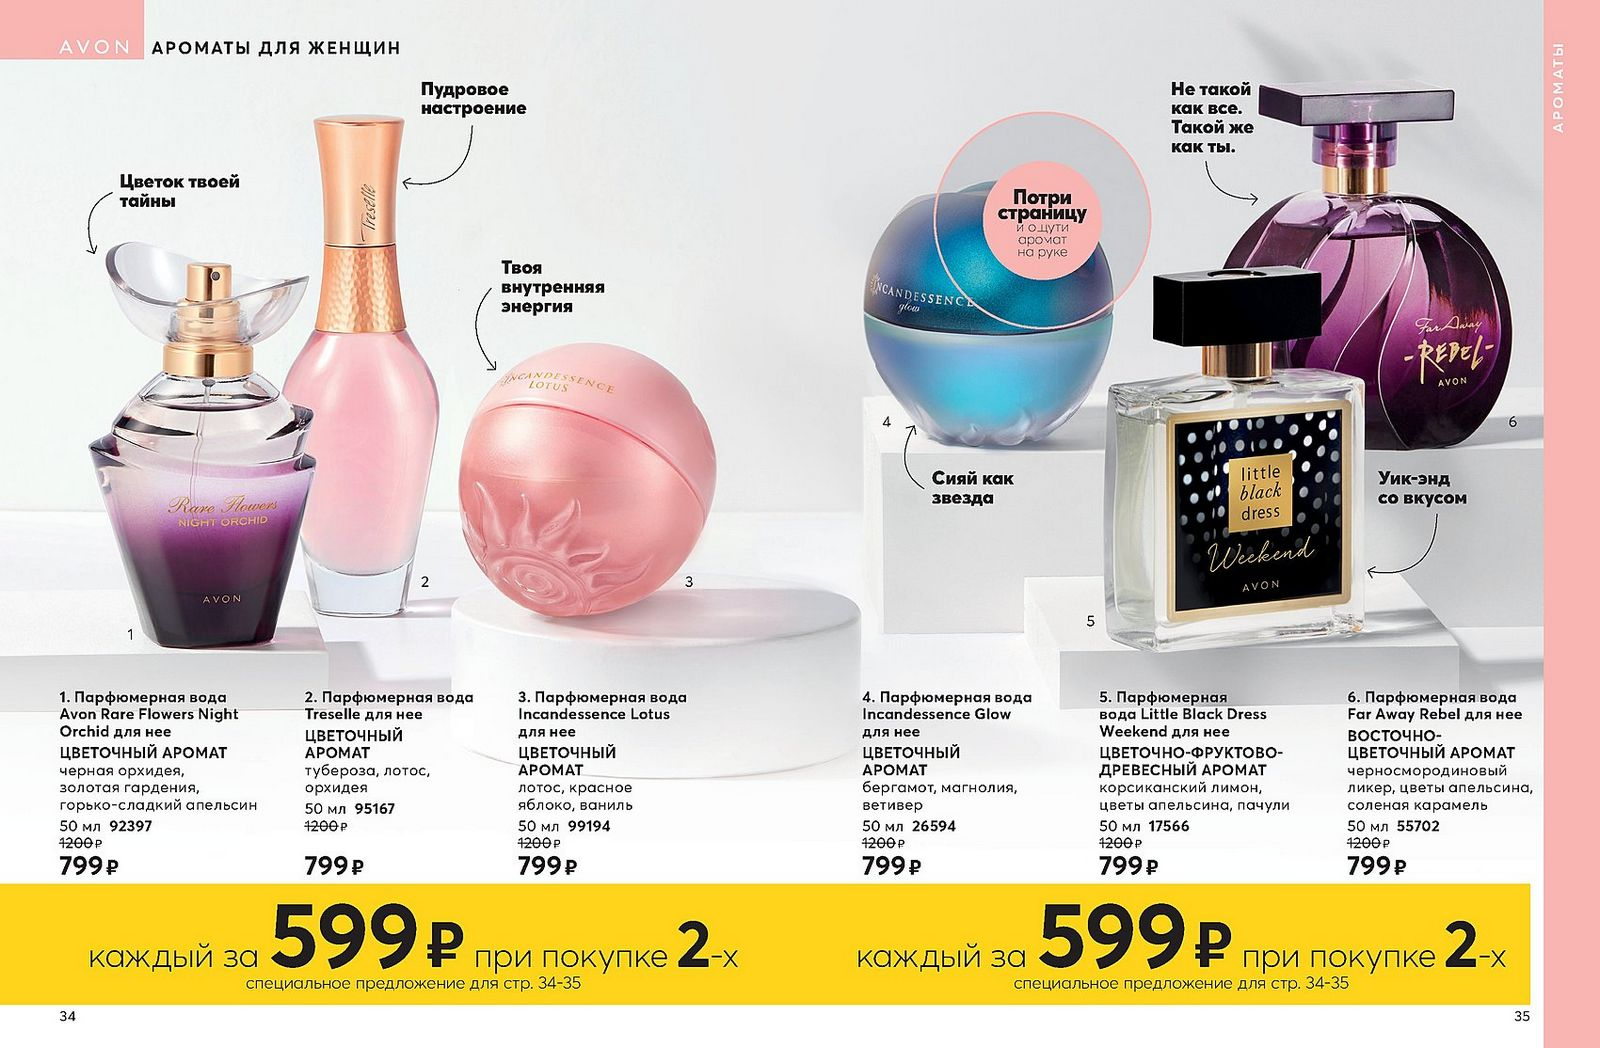 Avon 20 2021 банки для косметики стекло купить